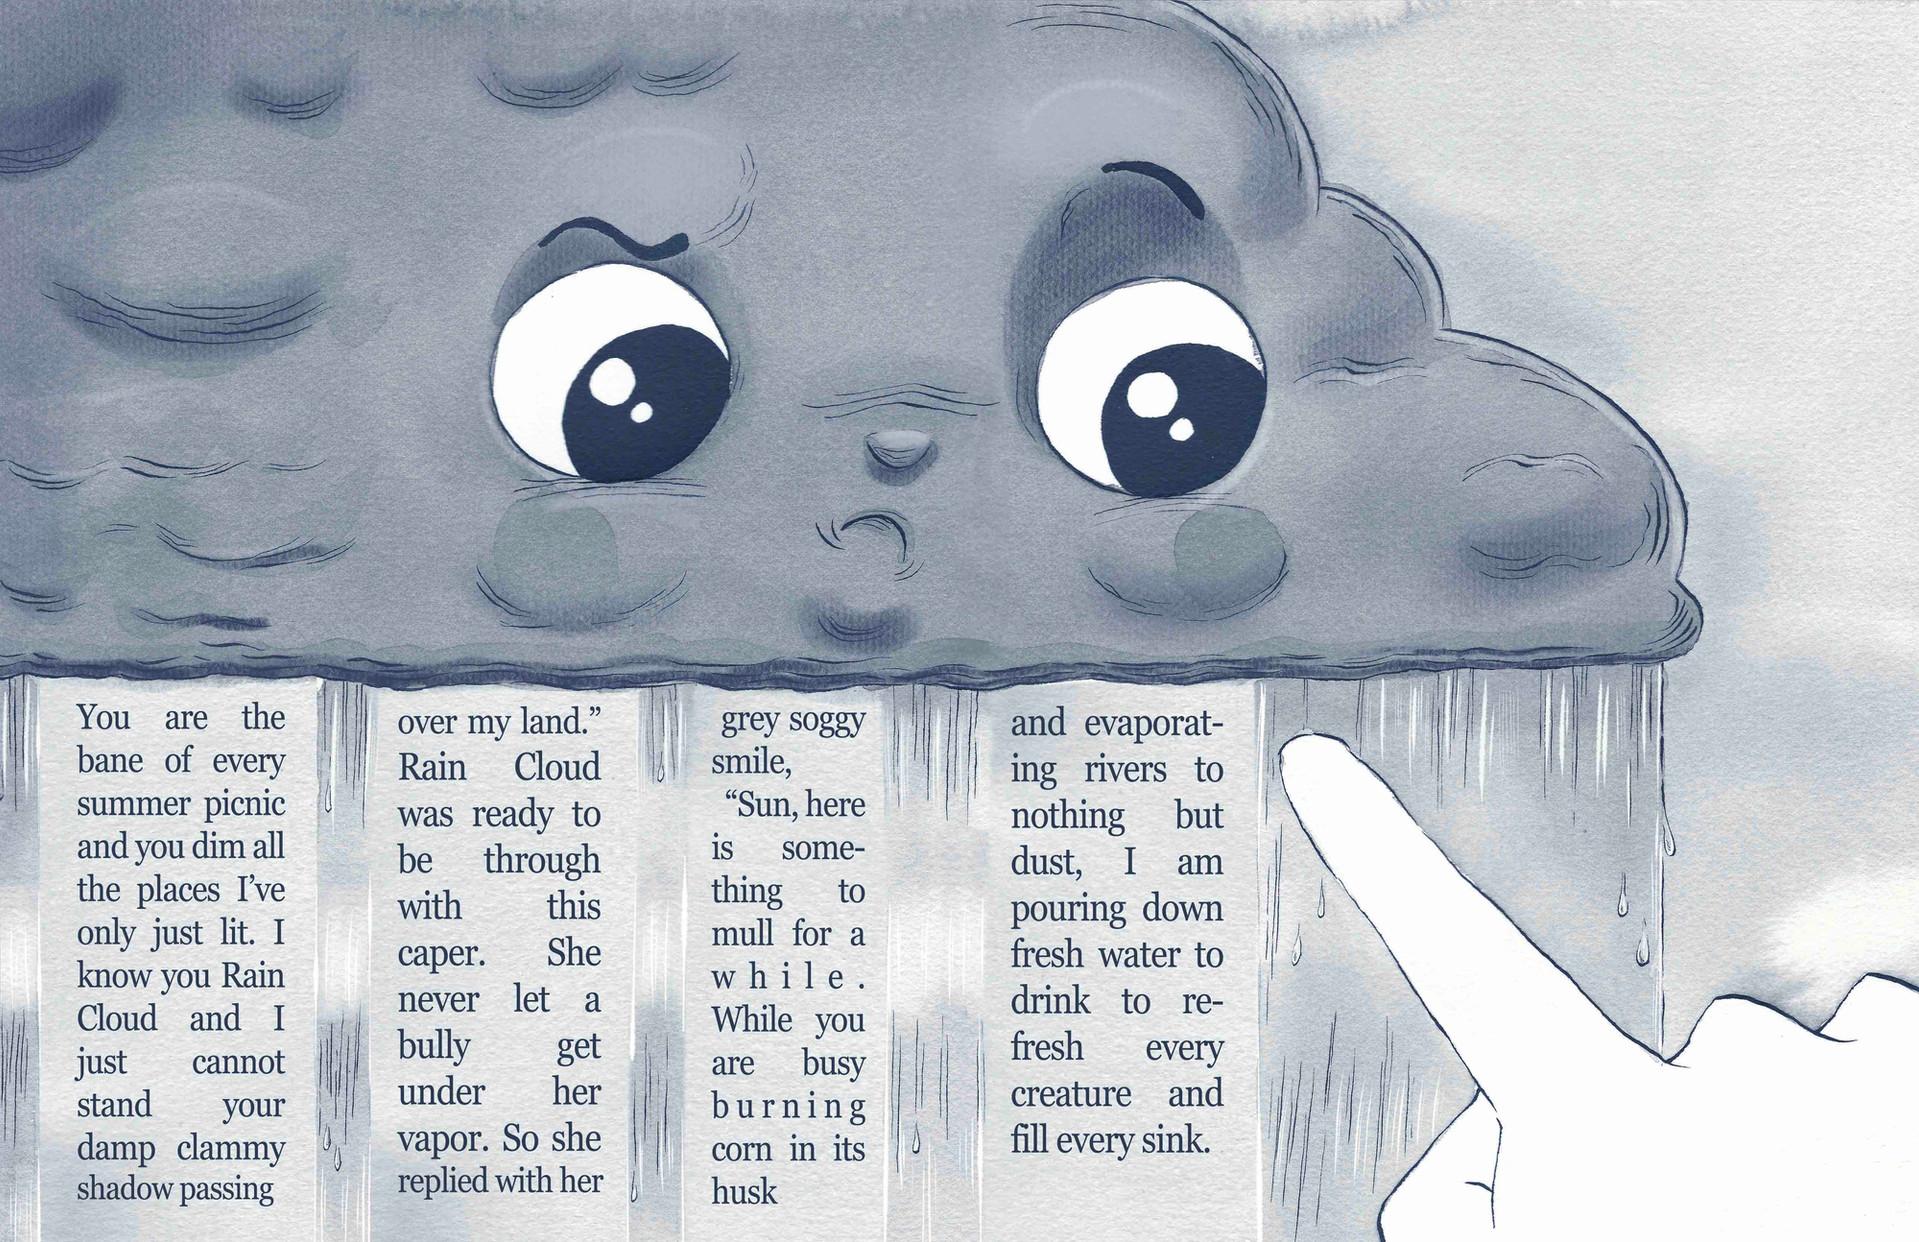 The Plucky Little Rain Cloud